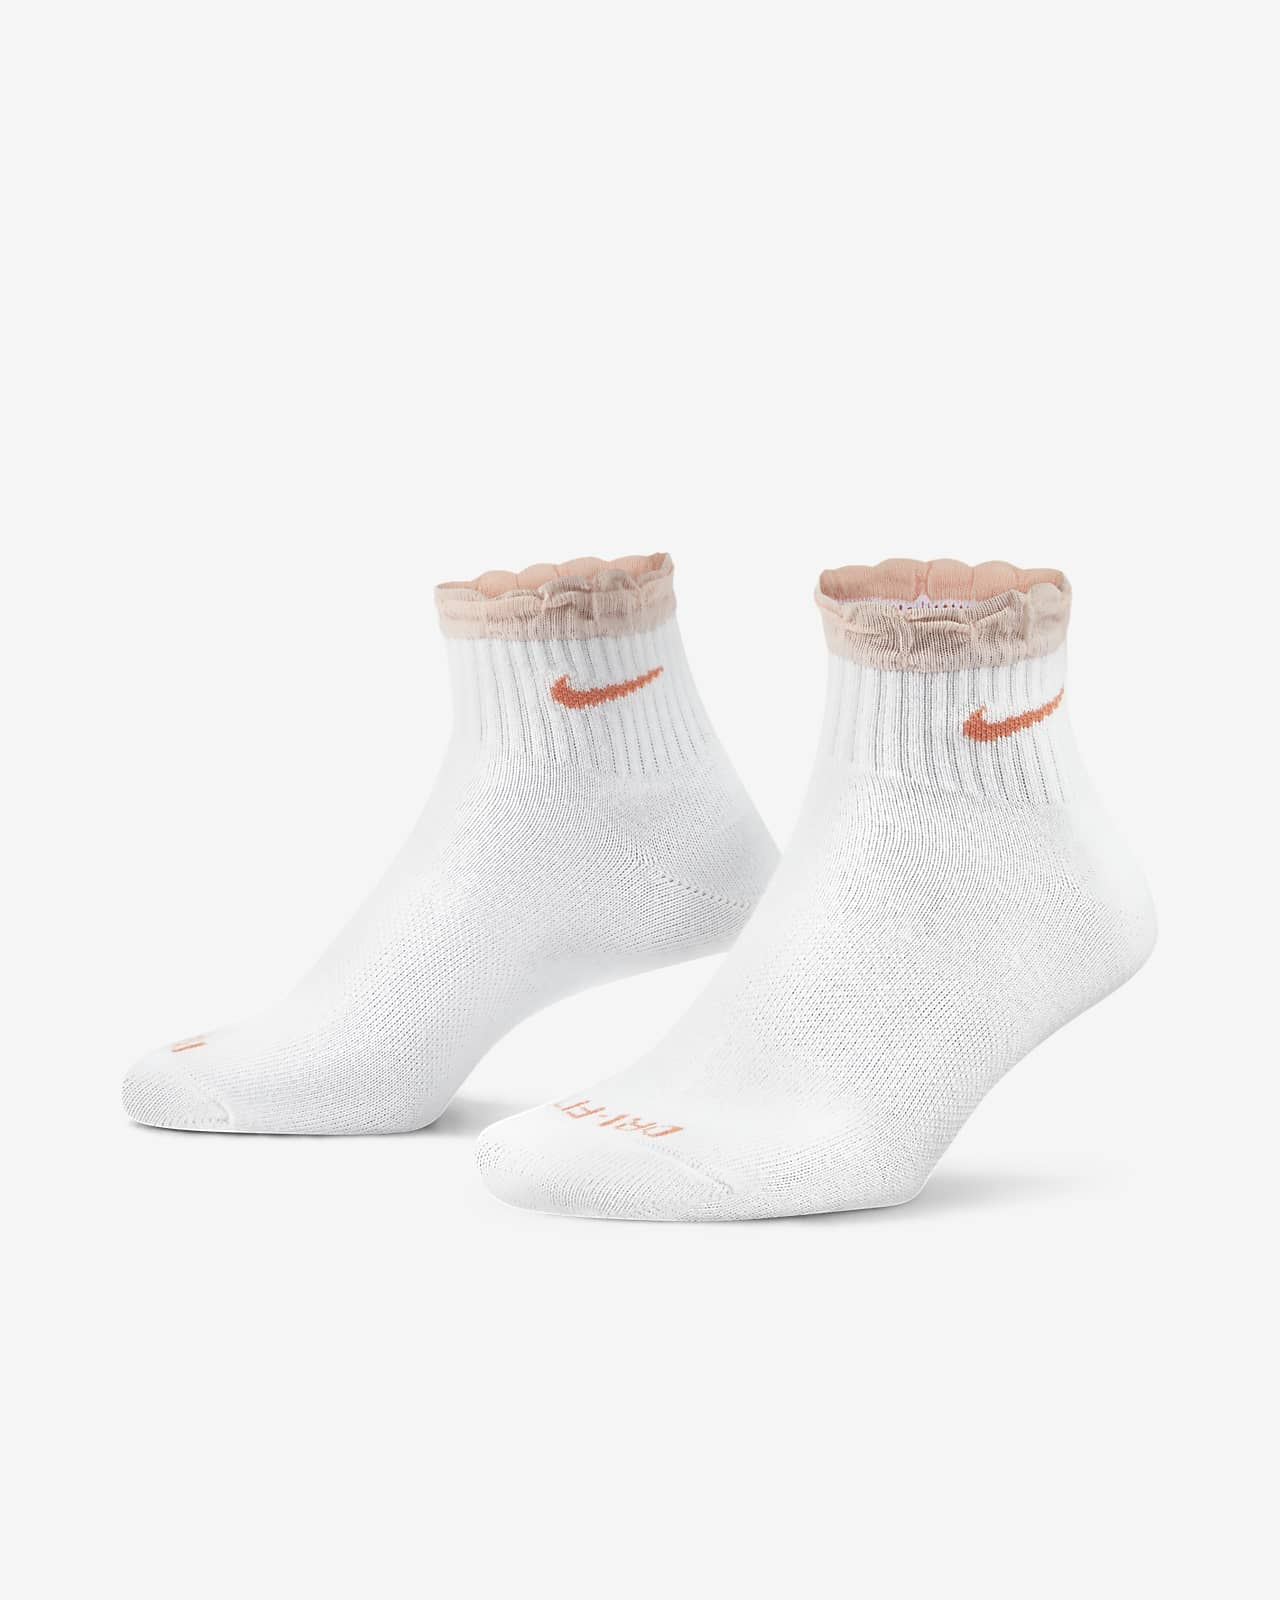 Nike Everyday Women's Training Ankle Socks